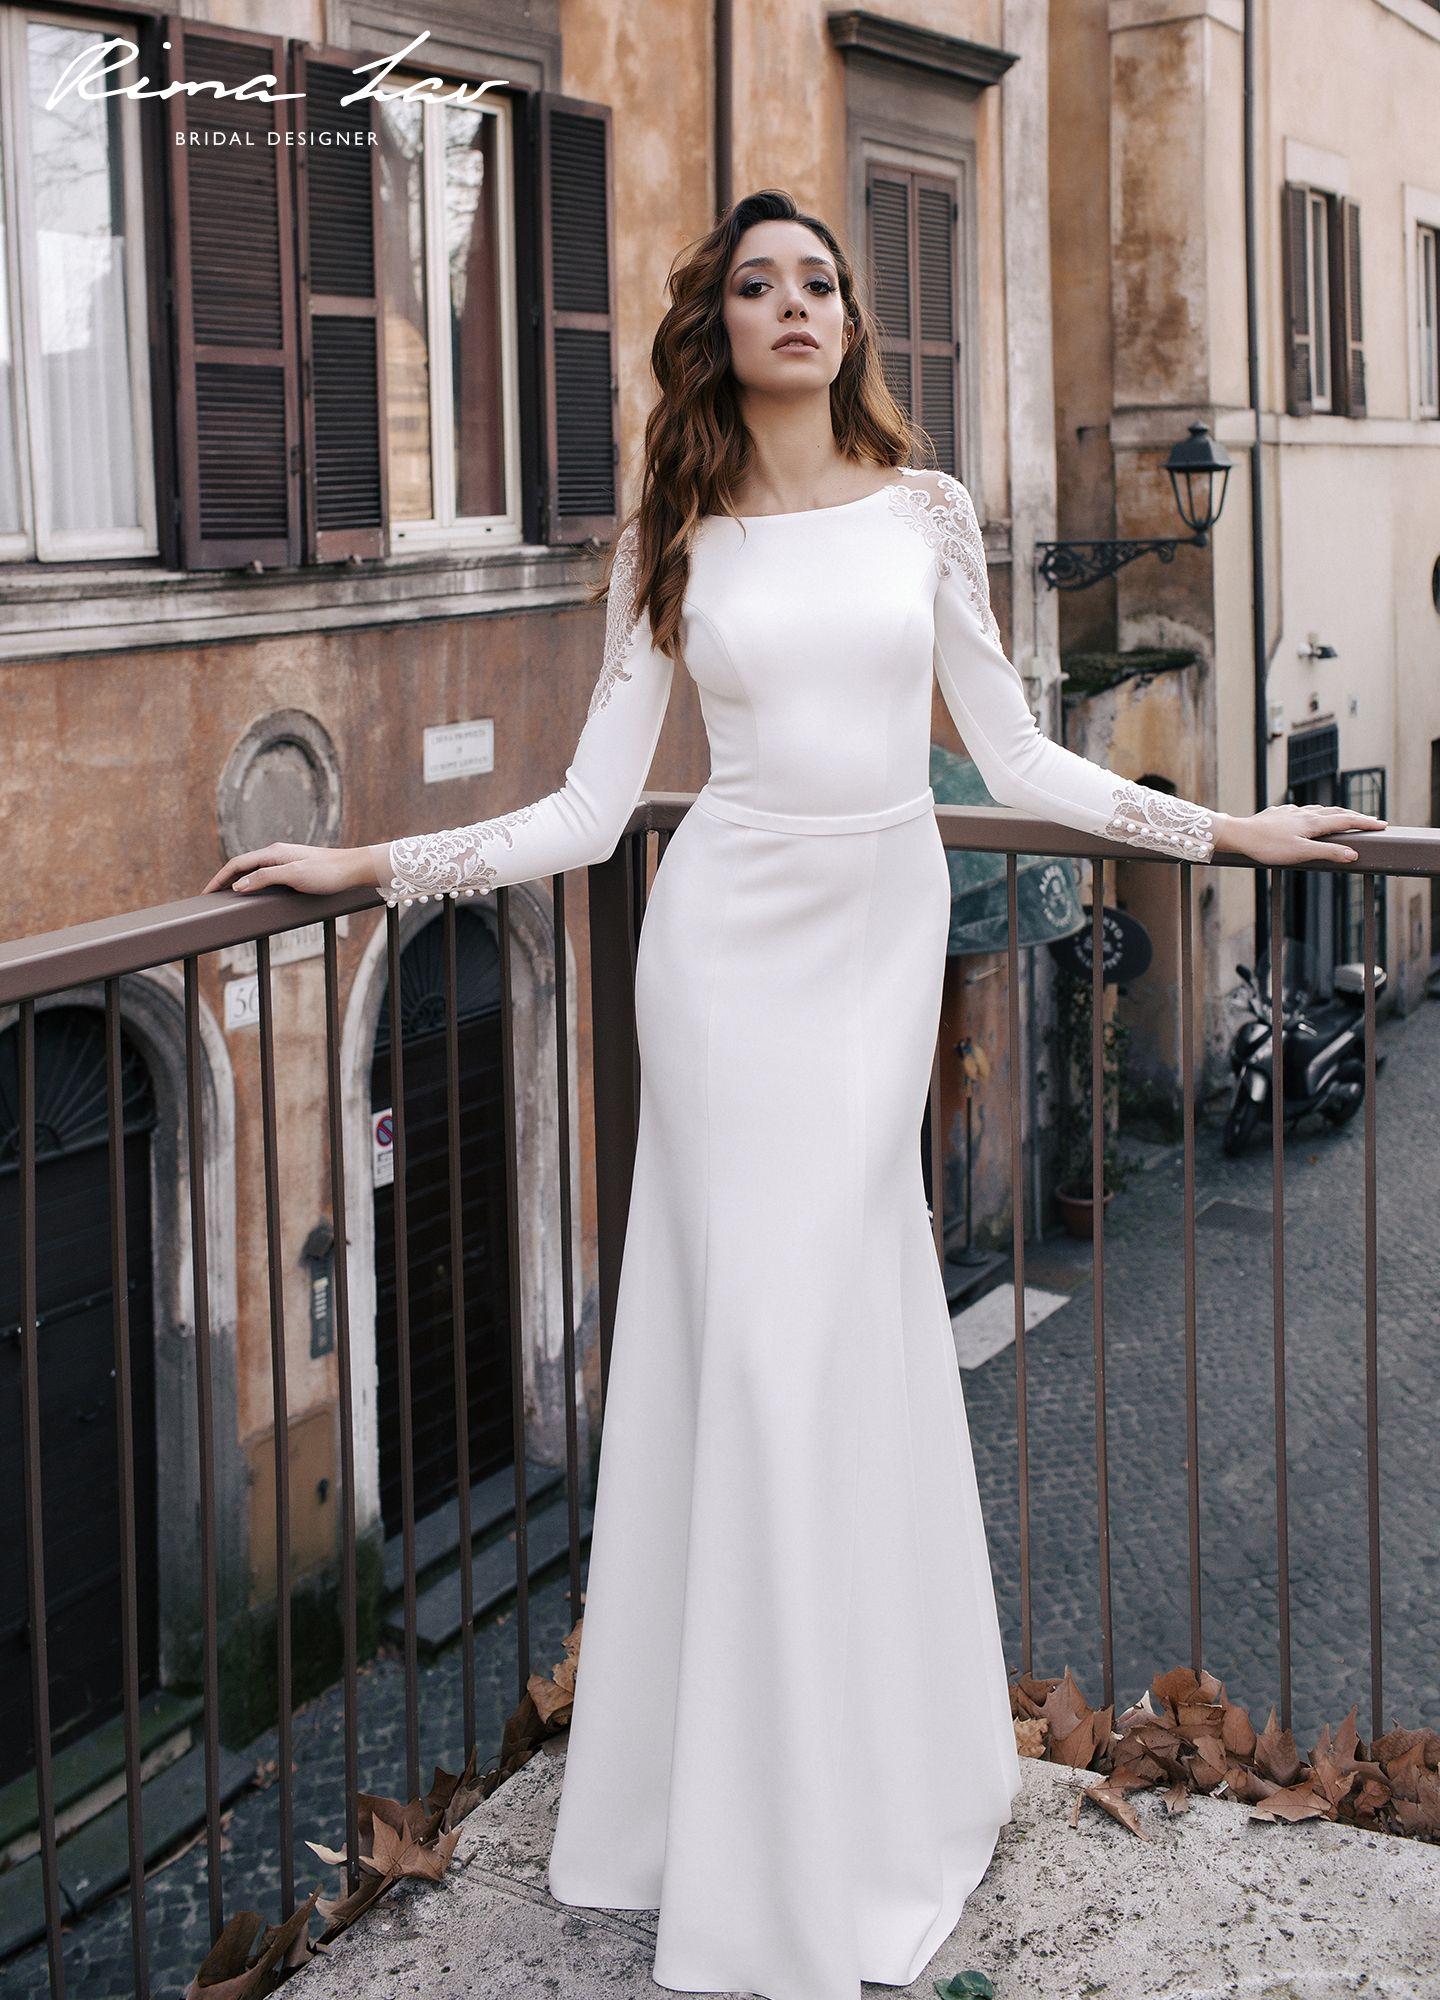 Evora Bridal Dress Rima Lav Wedding Sposa Svadebnoe Plate Fiance Bride Wedding Inspiration Plain Wedding Dress Wedding Dresses Wedding Dresses Satin [ 2000 x 1440 Pixel ]